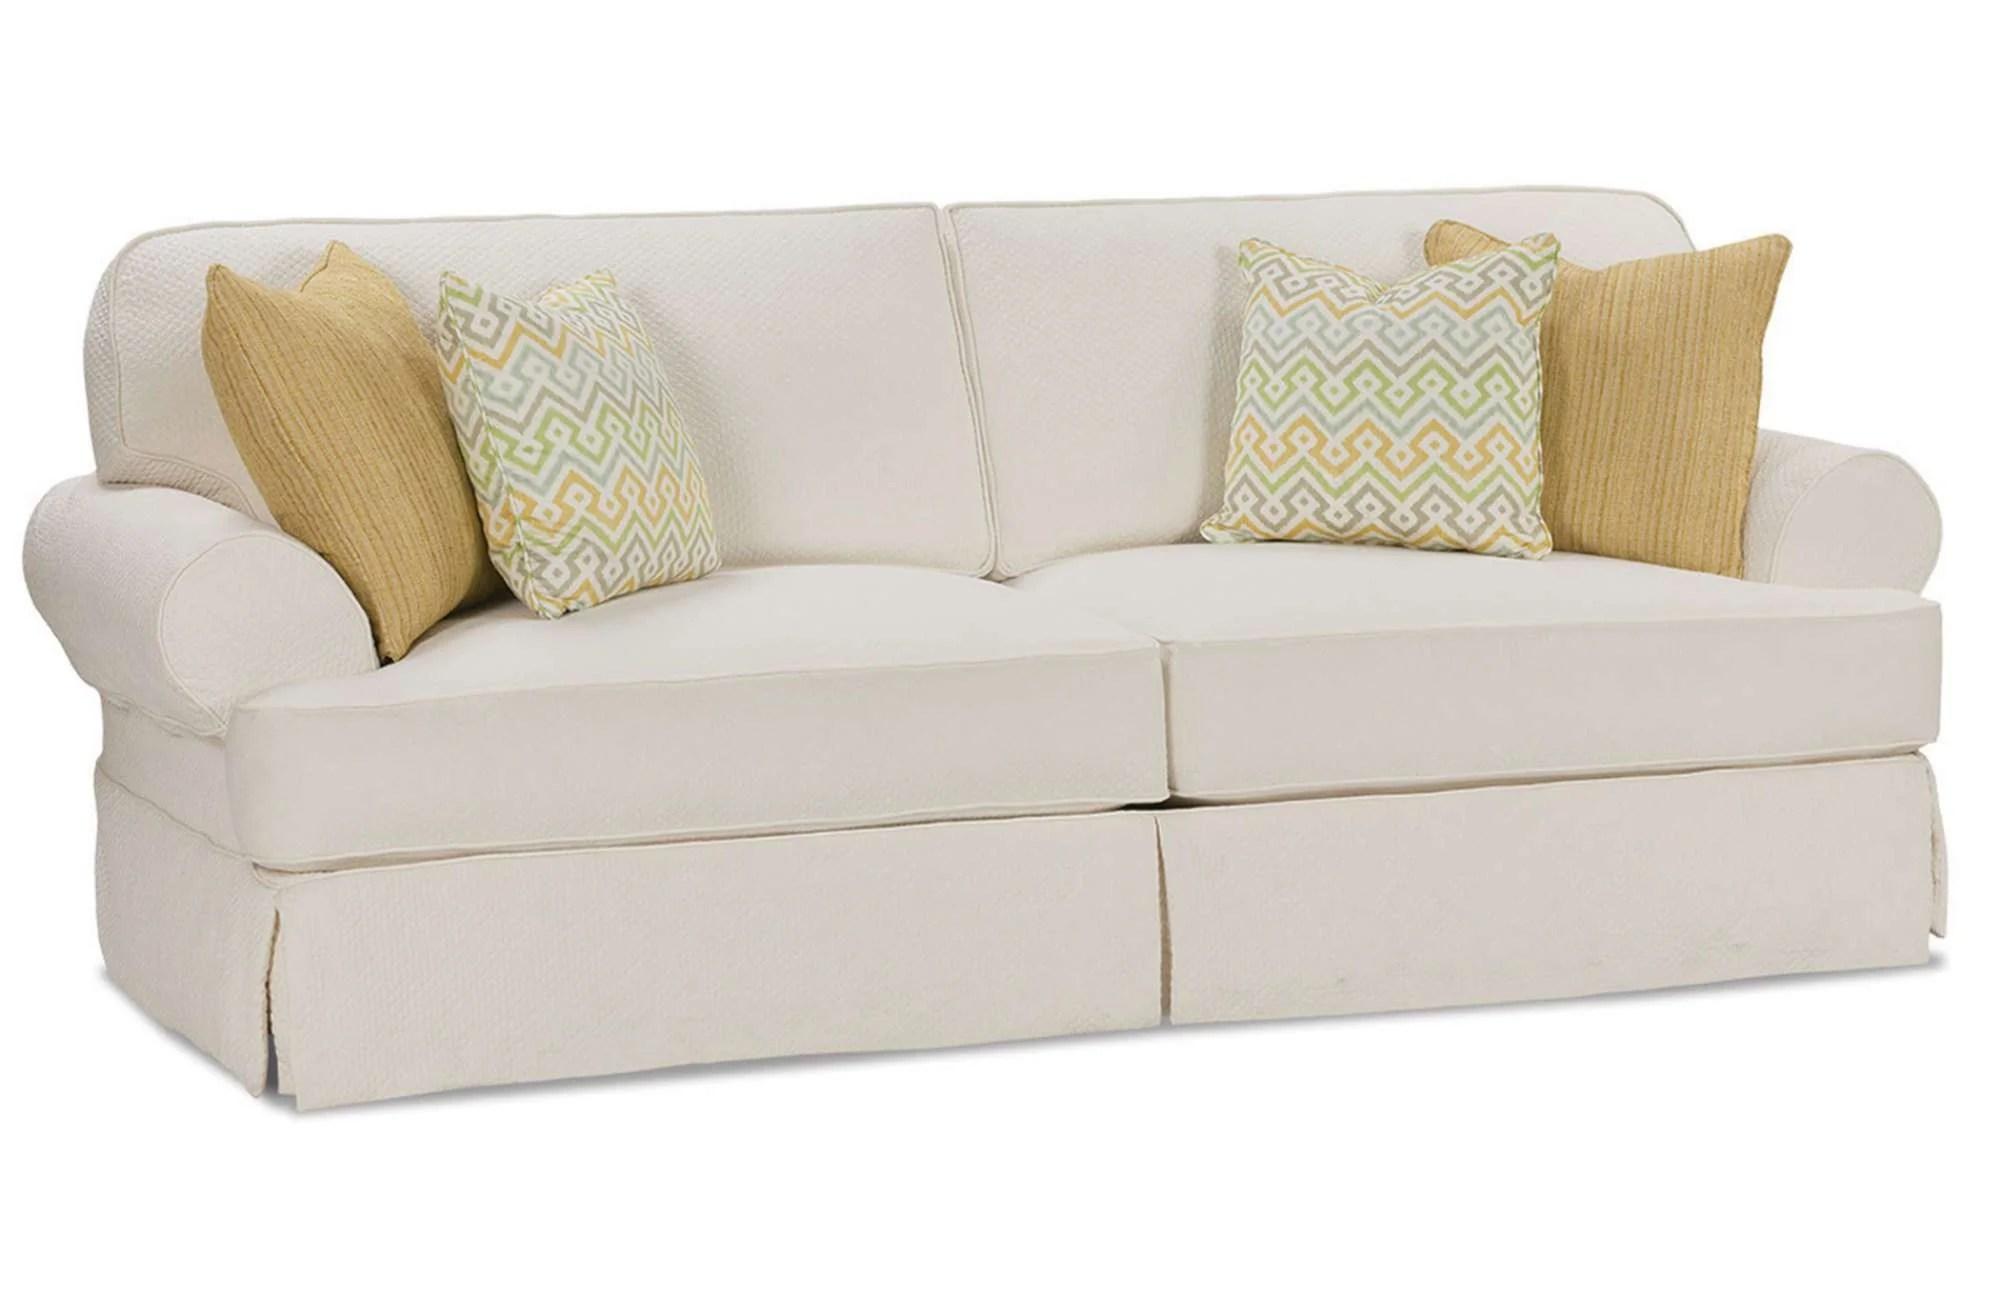 addison sofa ashley furniture curved sectional sofas fabric kagan s home rowe